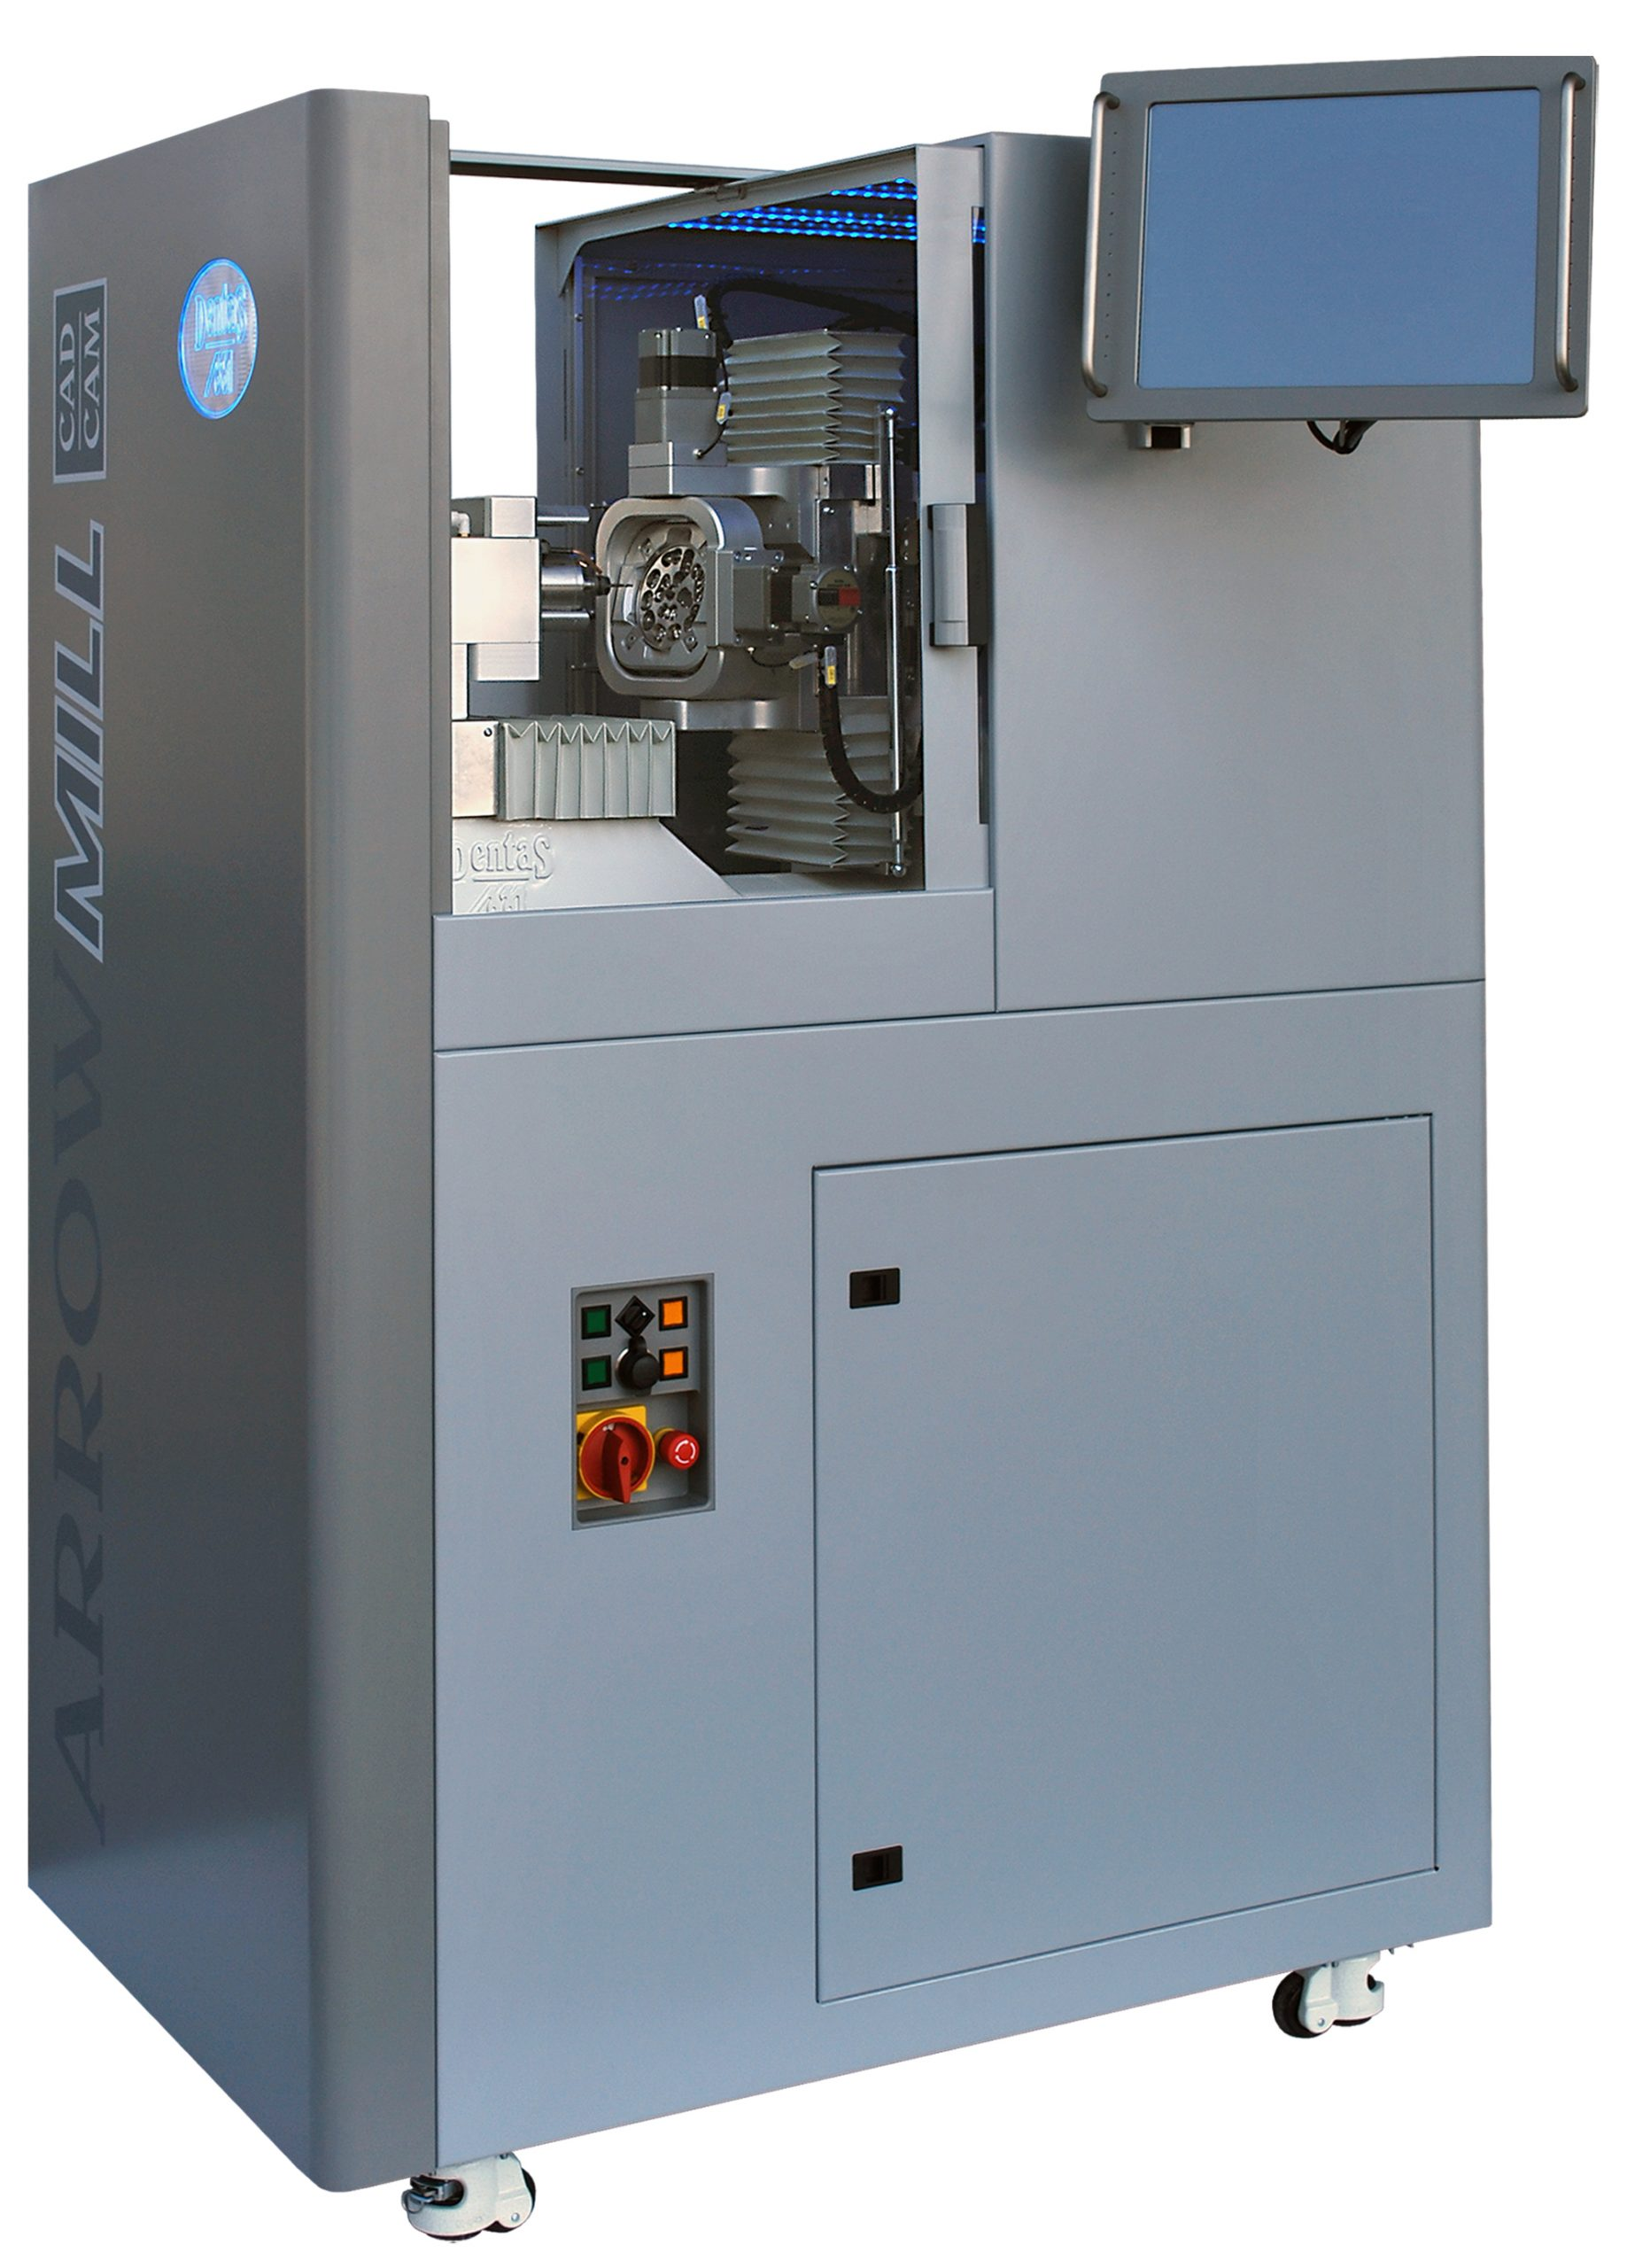 1st CNC CAD/CAM milling machine Arrow Mill